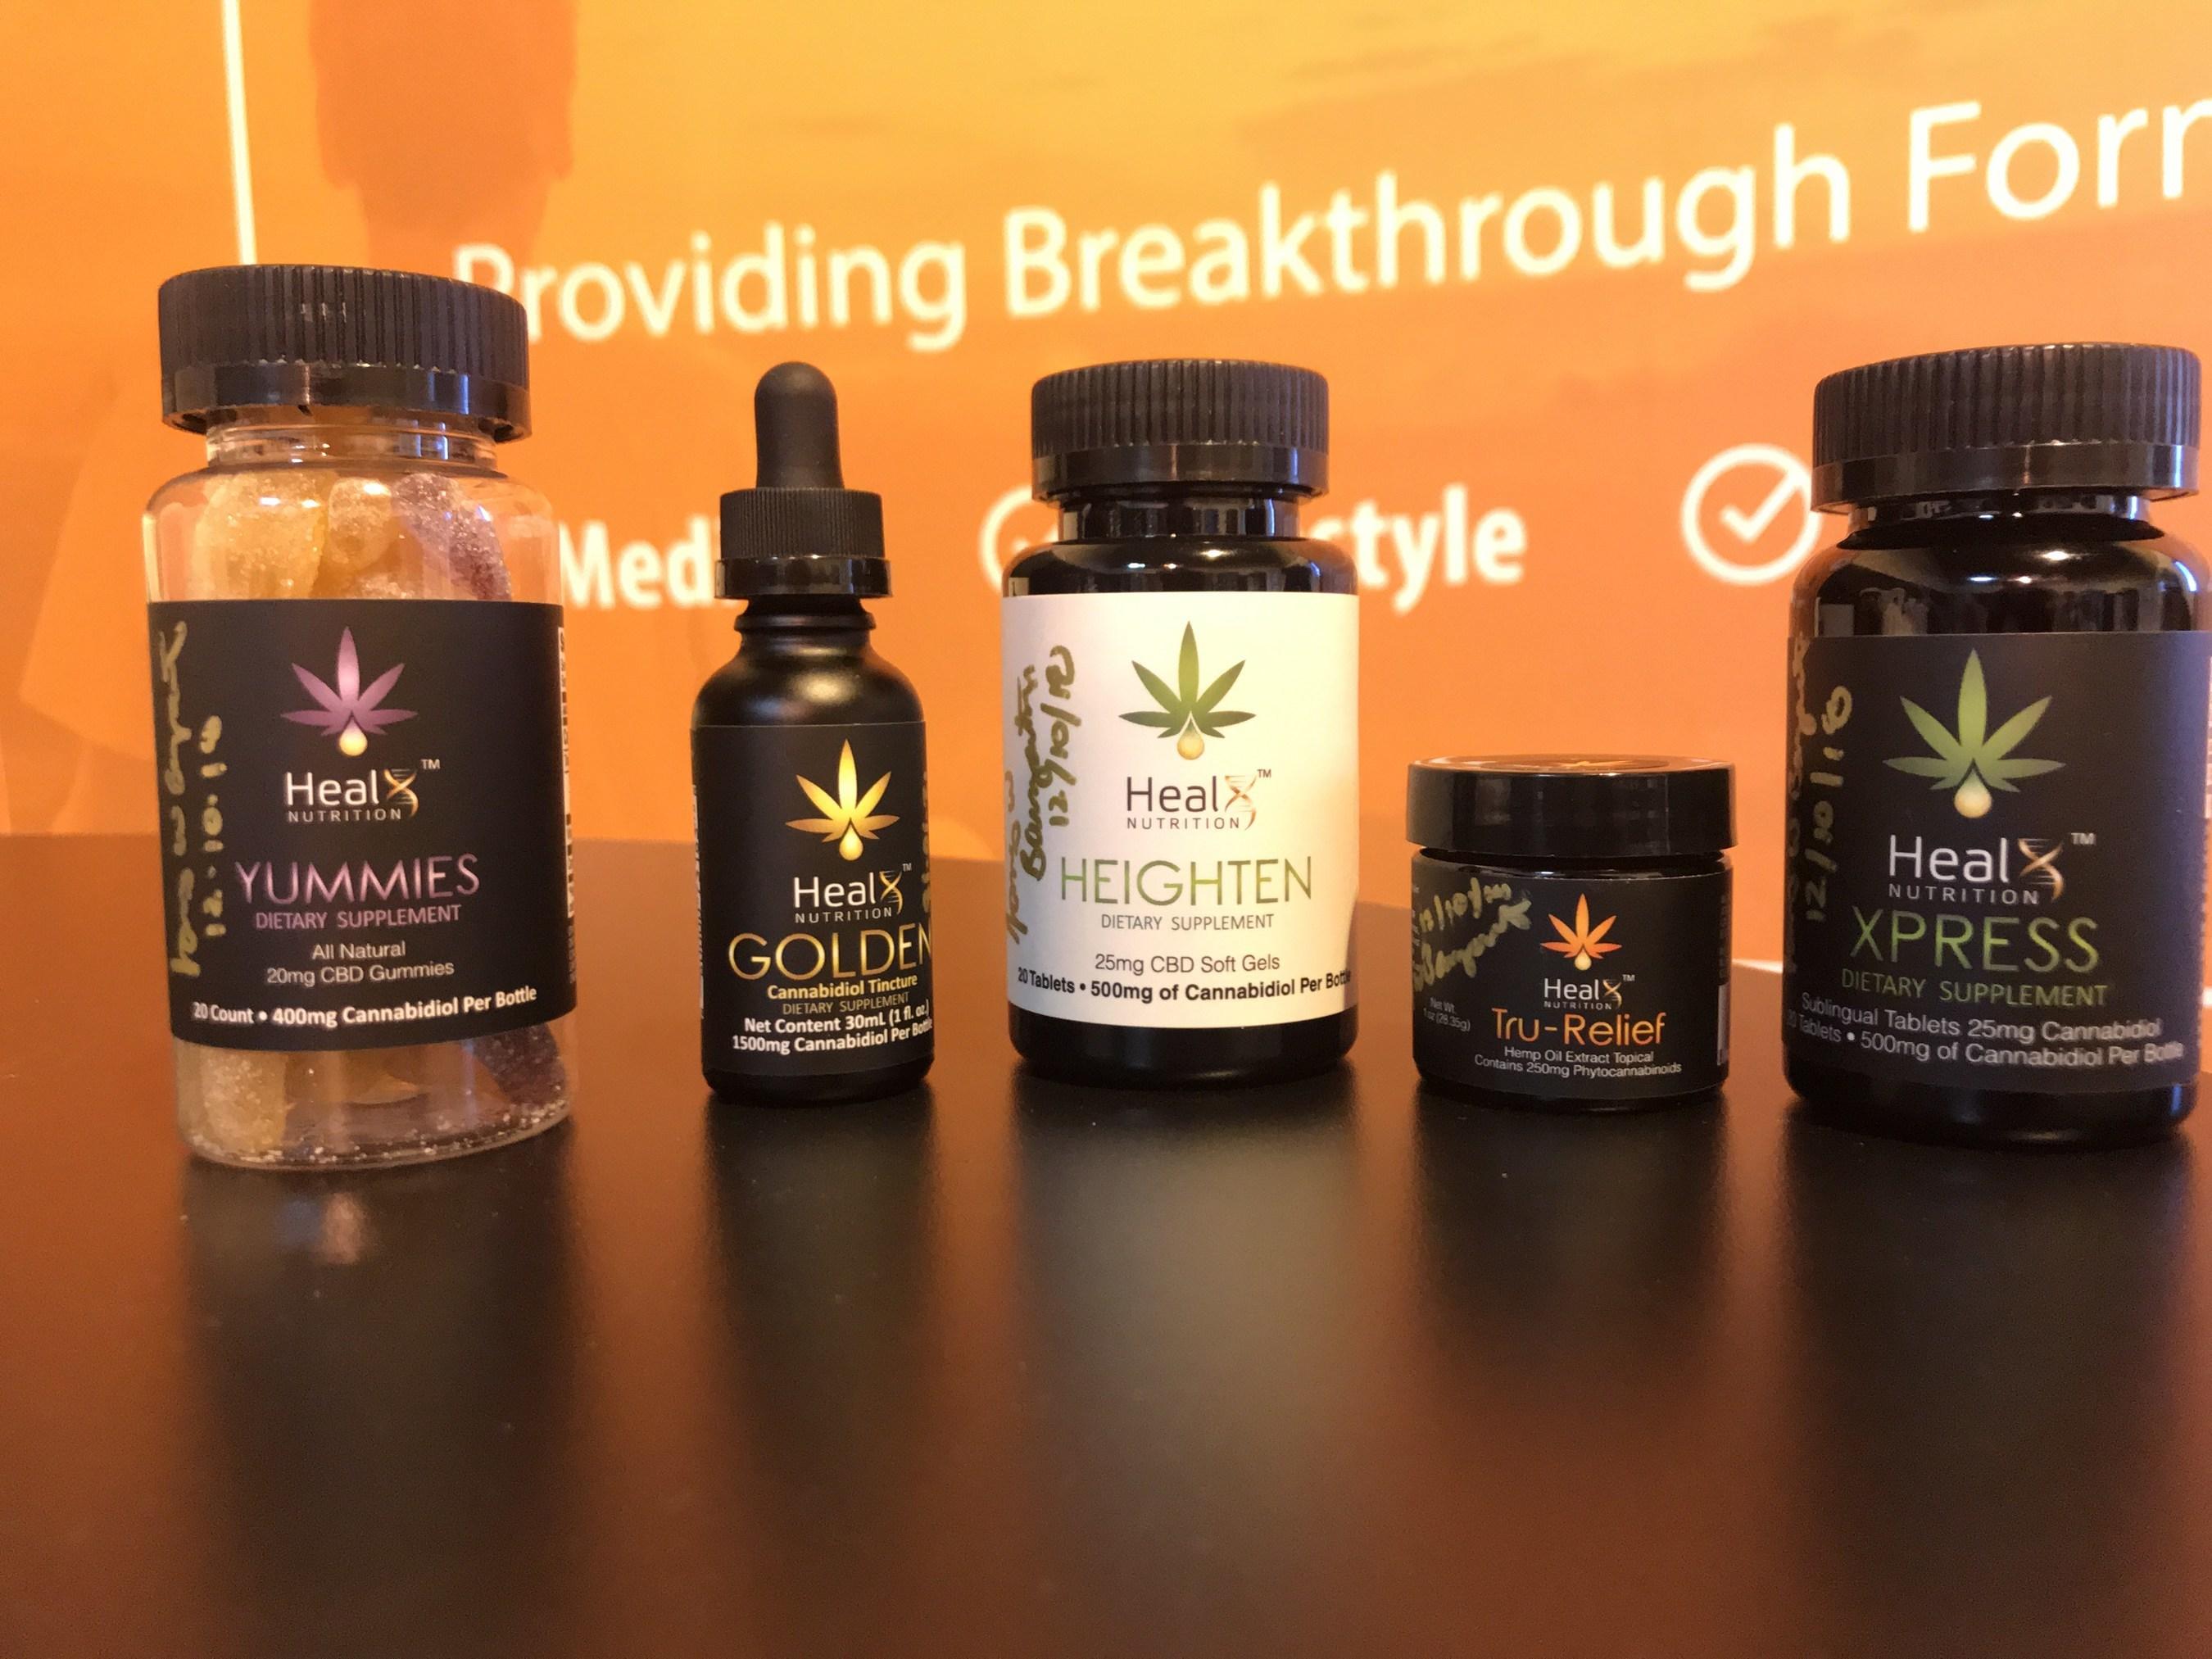 HealX Nutrition